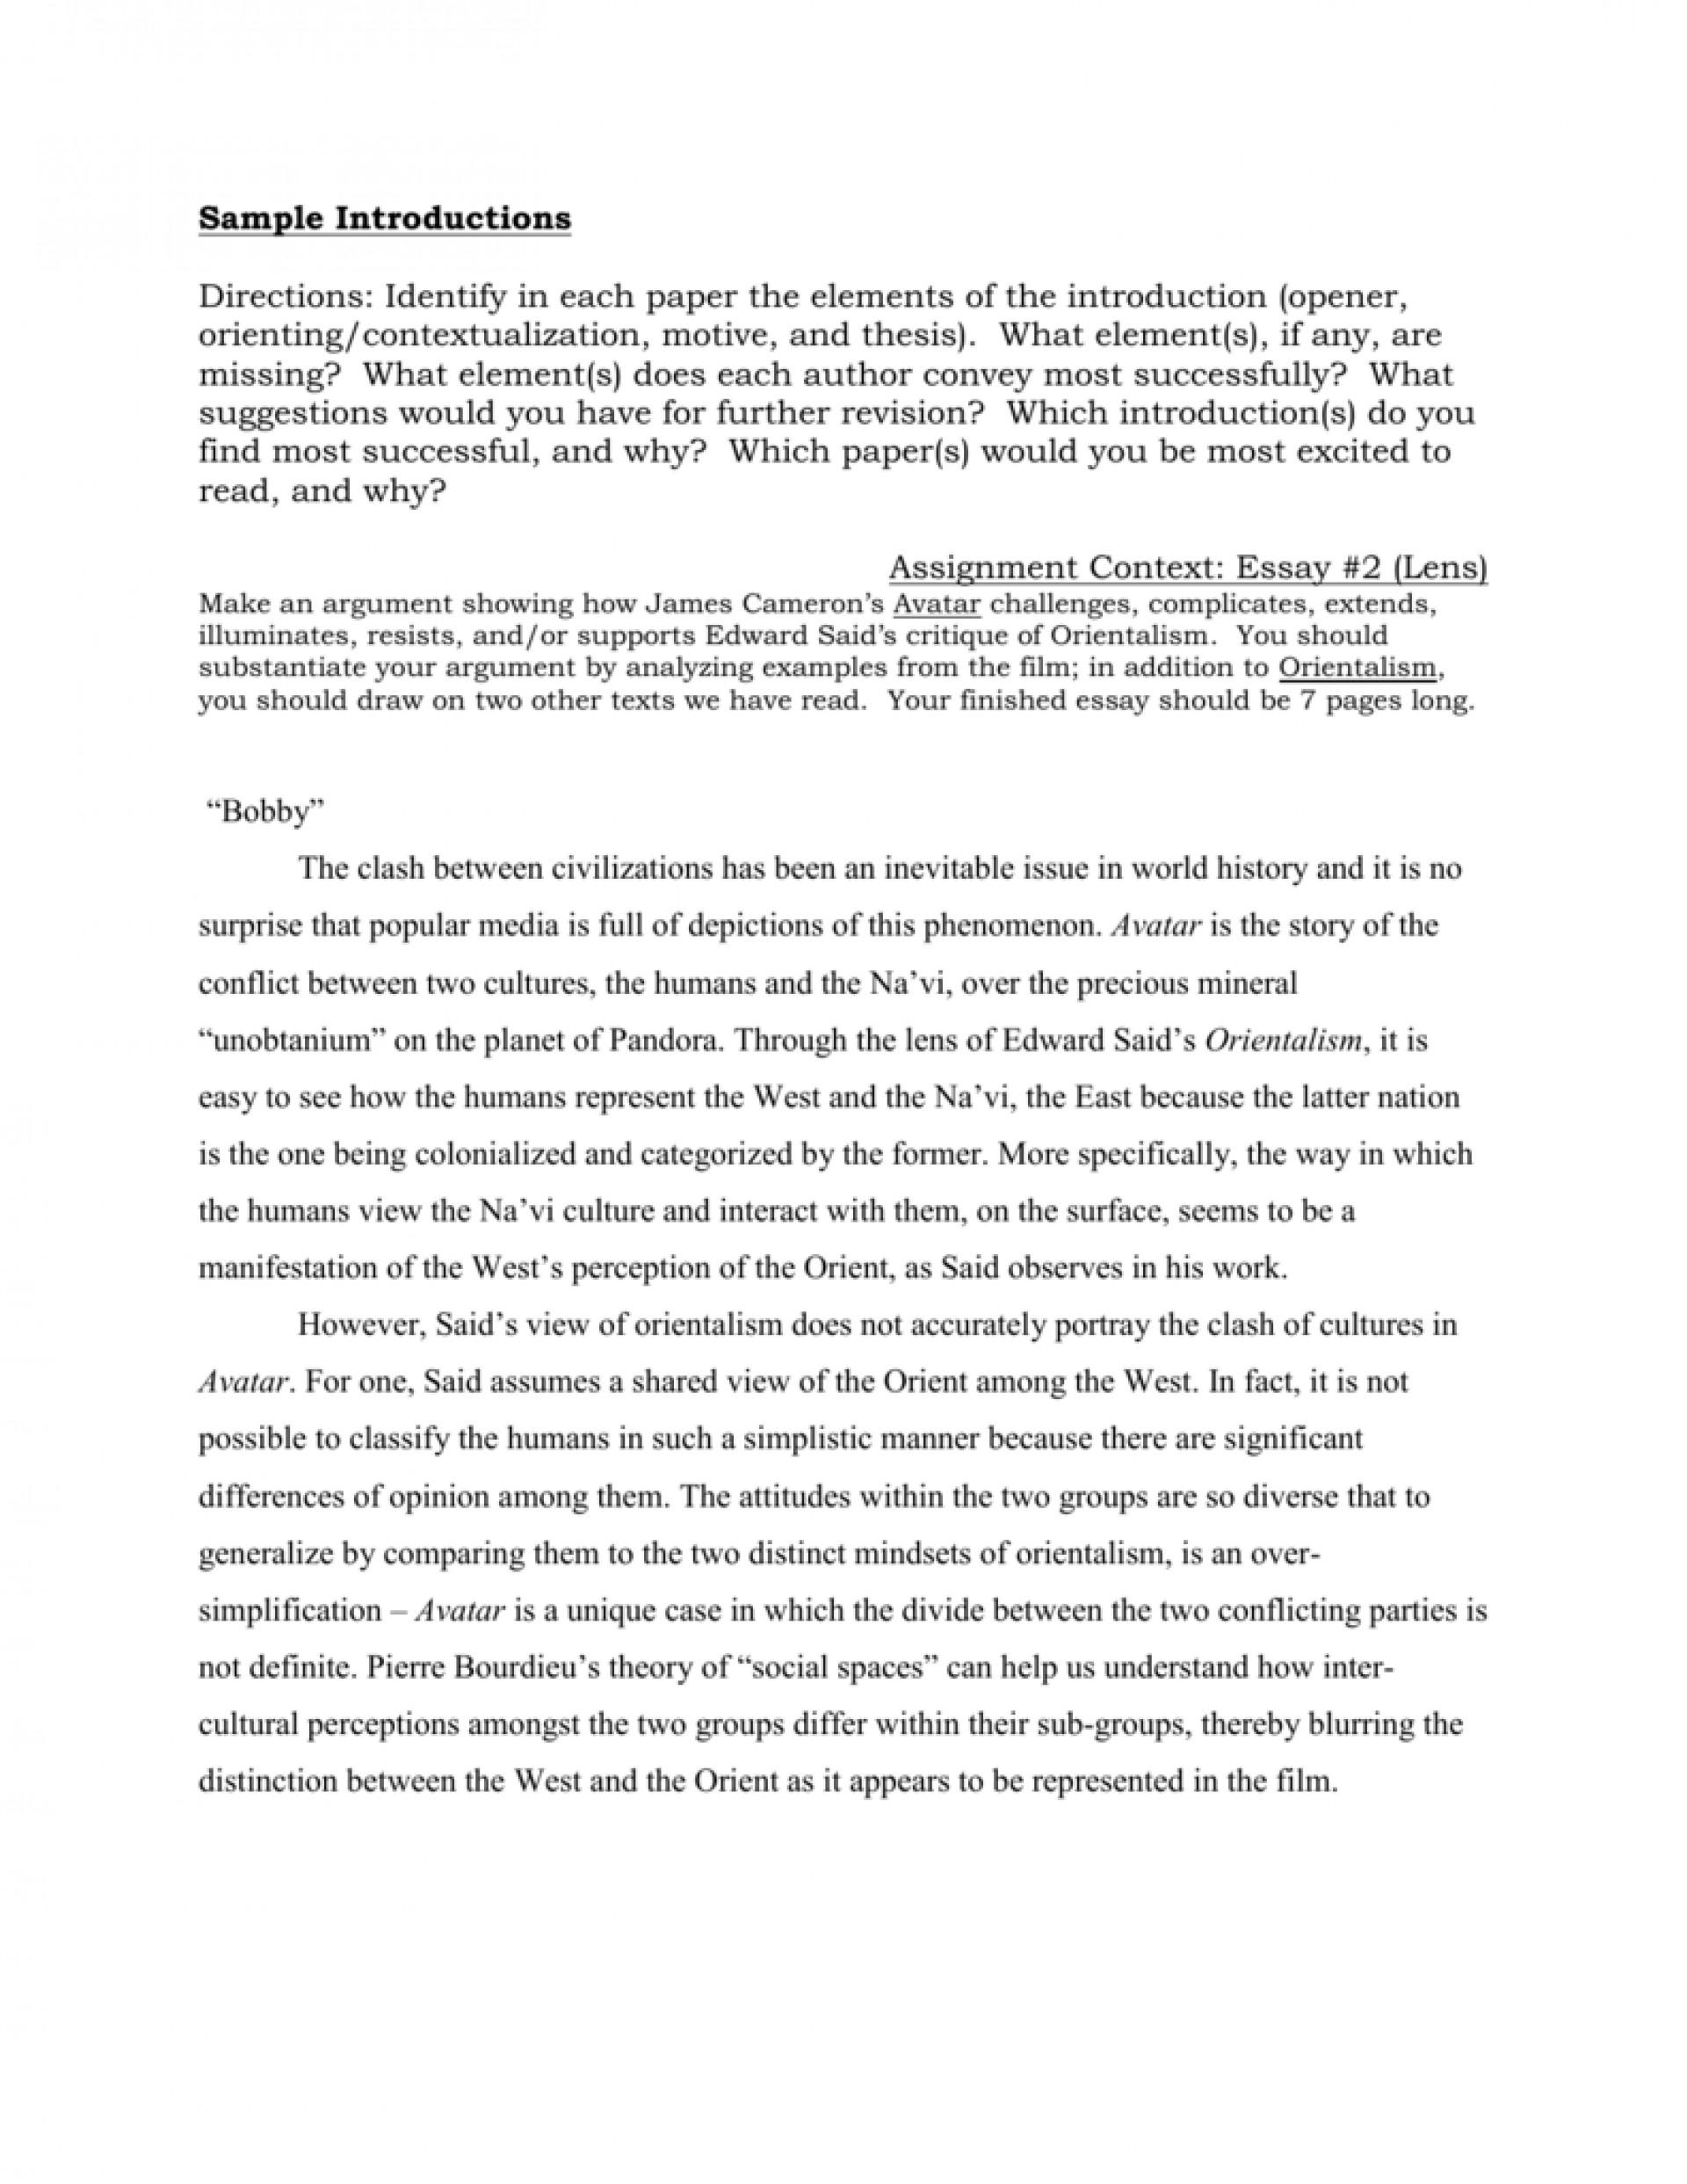 009 Essay Example Avatar Imperialism 009173125 1 Stirring 1920